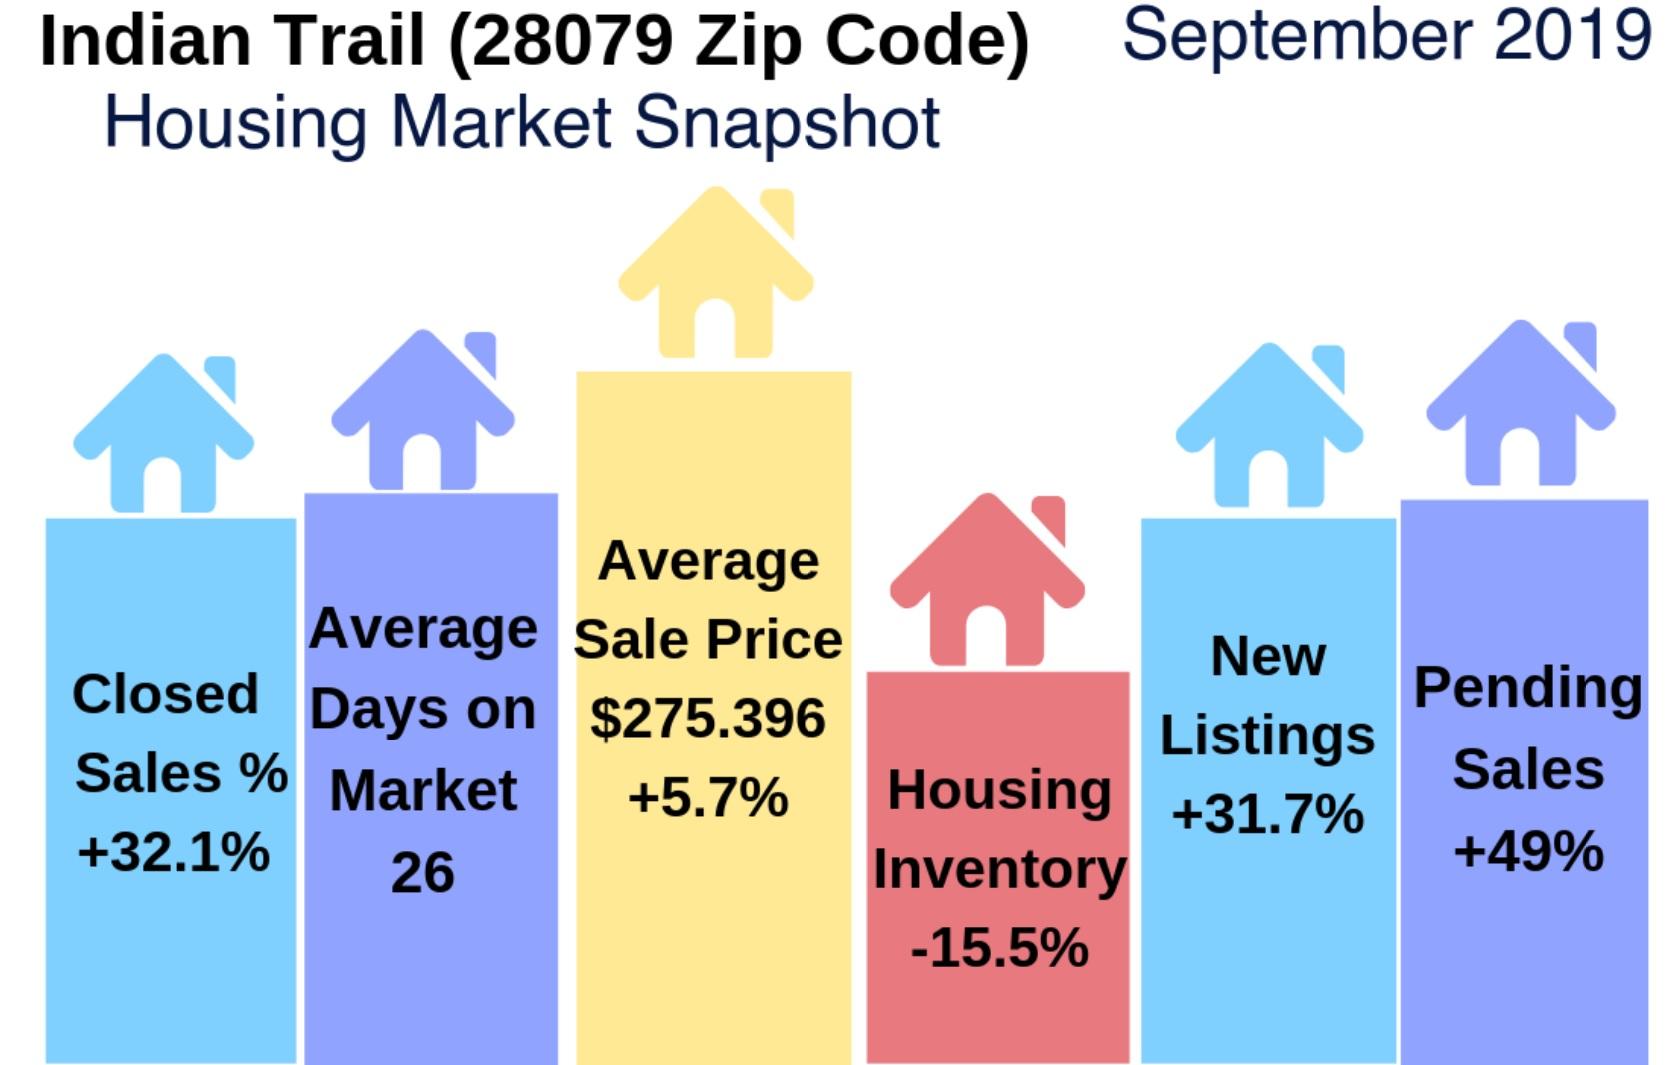 Indian Trail, NC (28079 Zip Code) Housing Market Update: September 2019